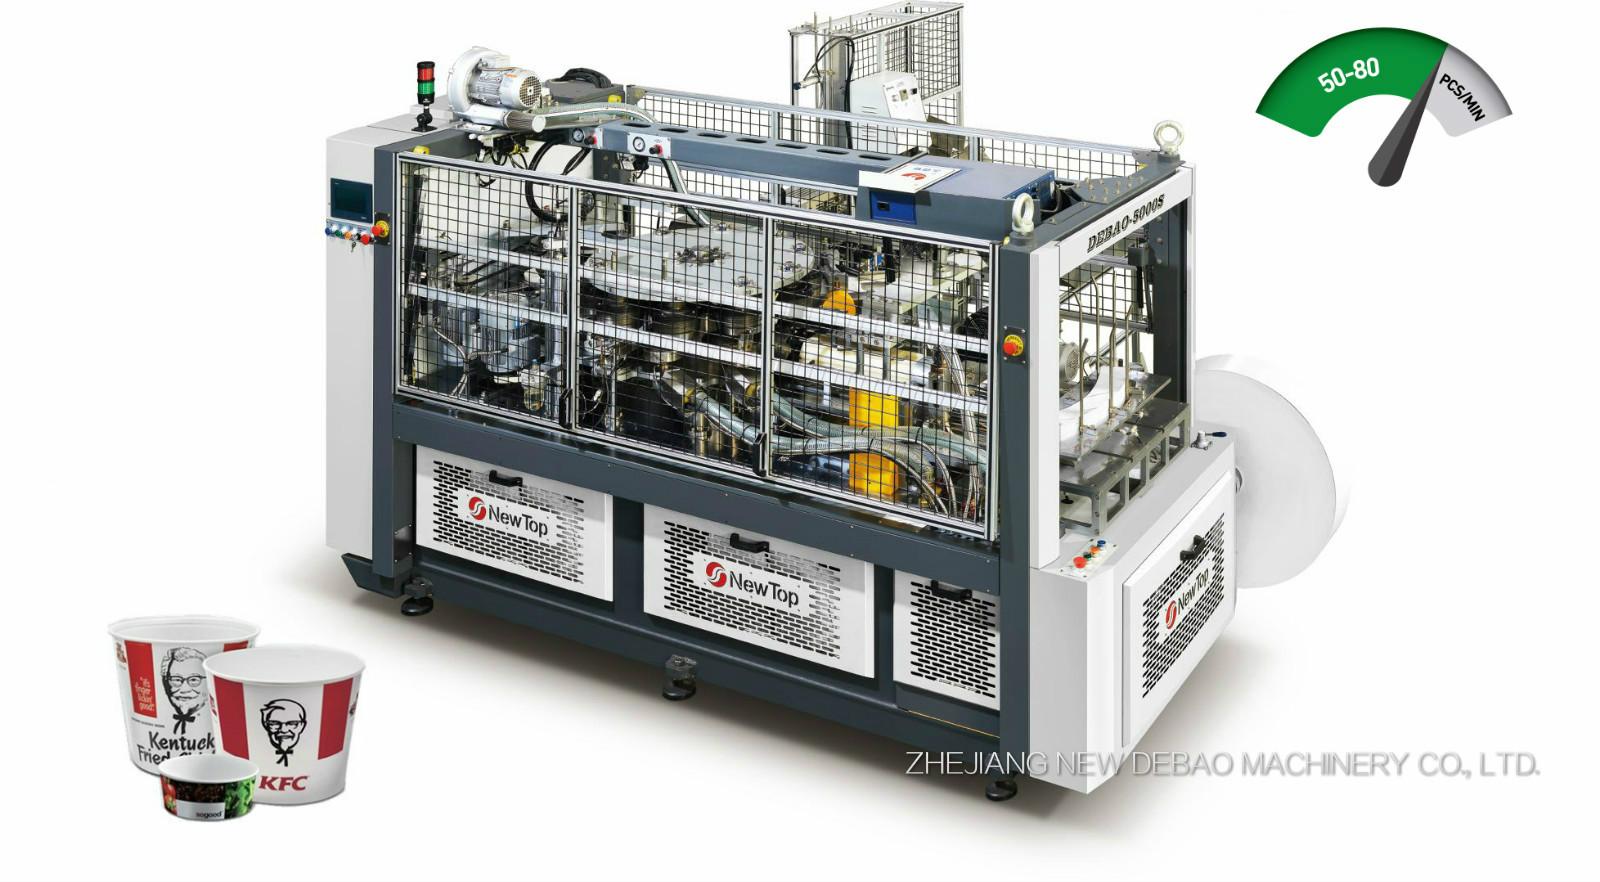 New Debao Machinery Array image104